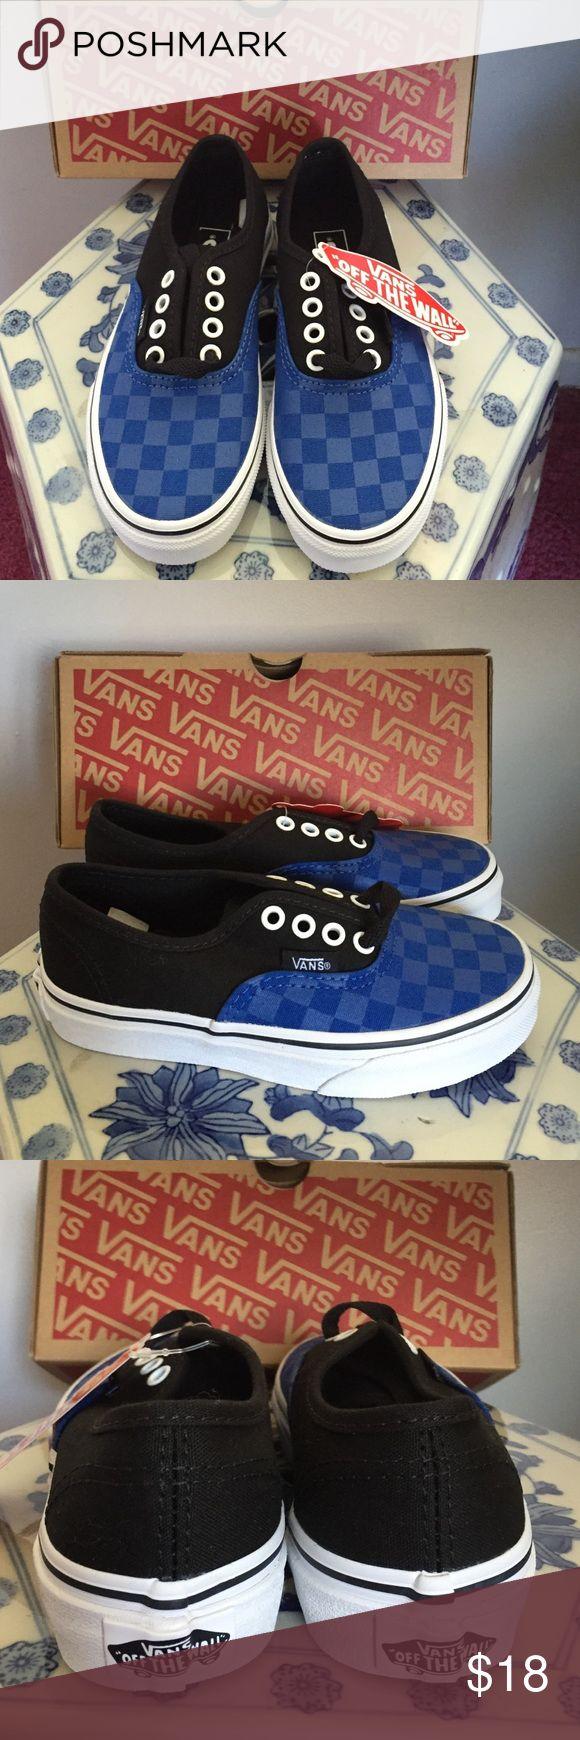 New Authentic Vans unisex kids shoes Nice canvas material Vans Shoes Sneakers